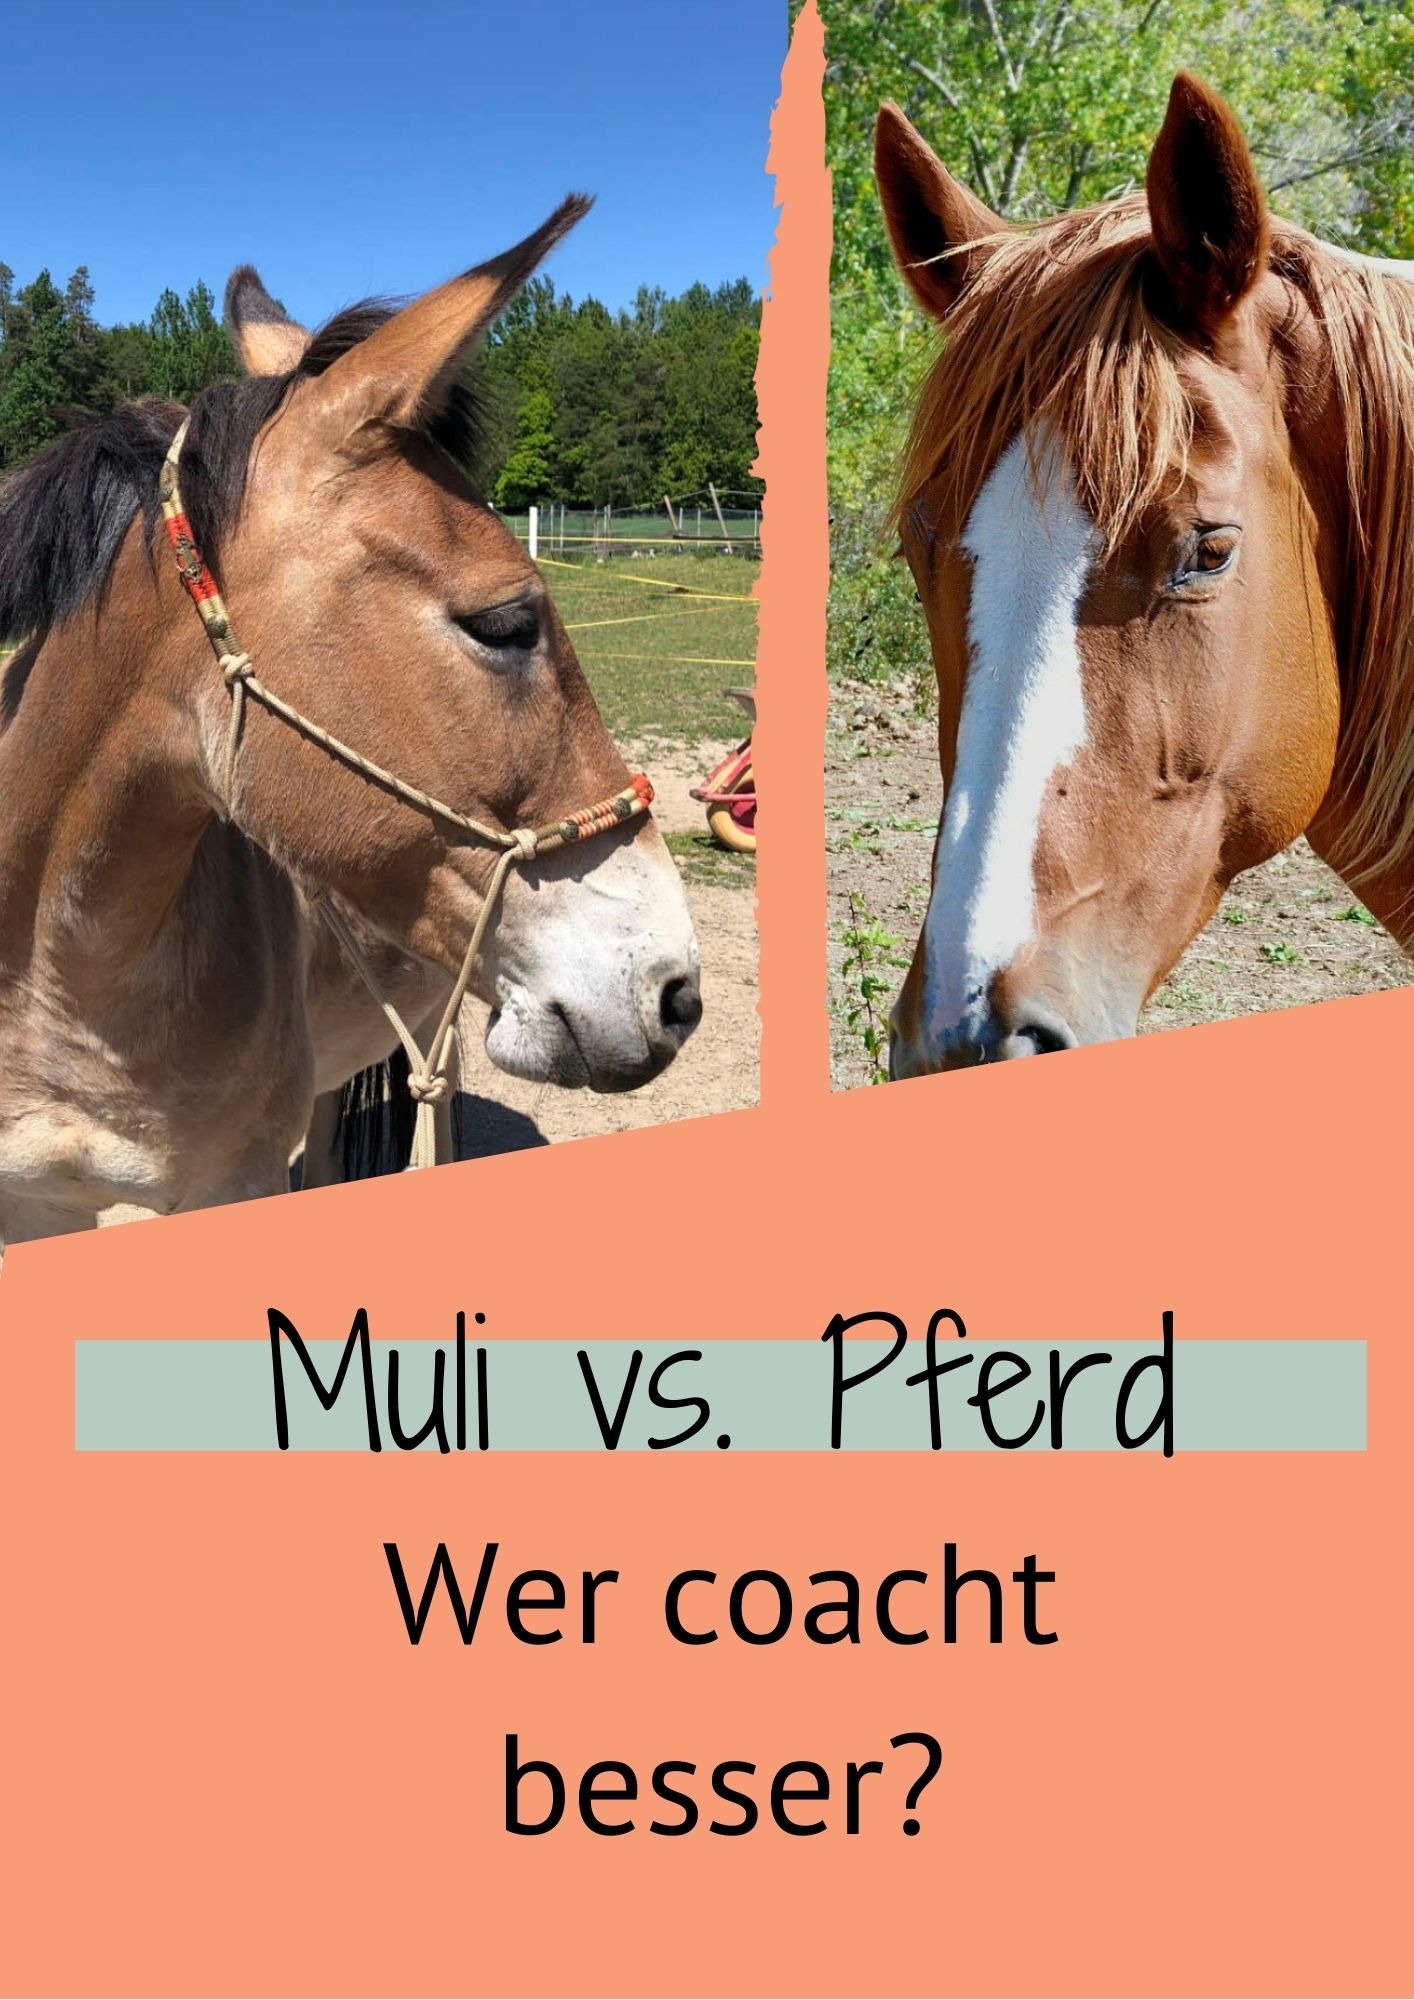 muli vs. Pferd - wer coacht besser?